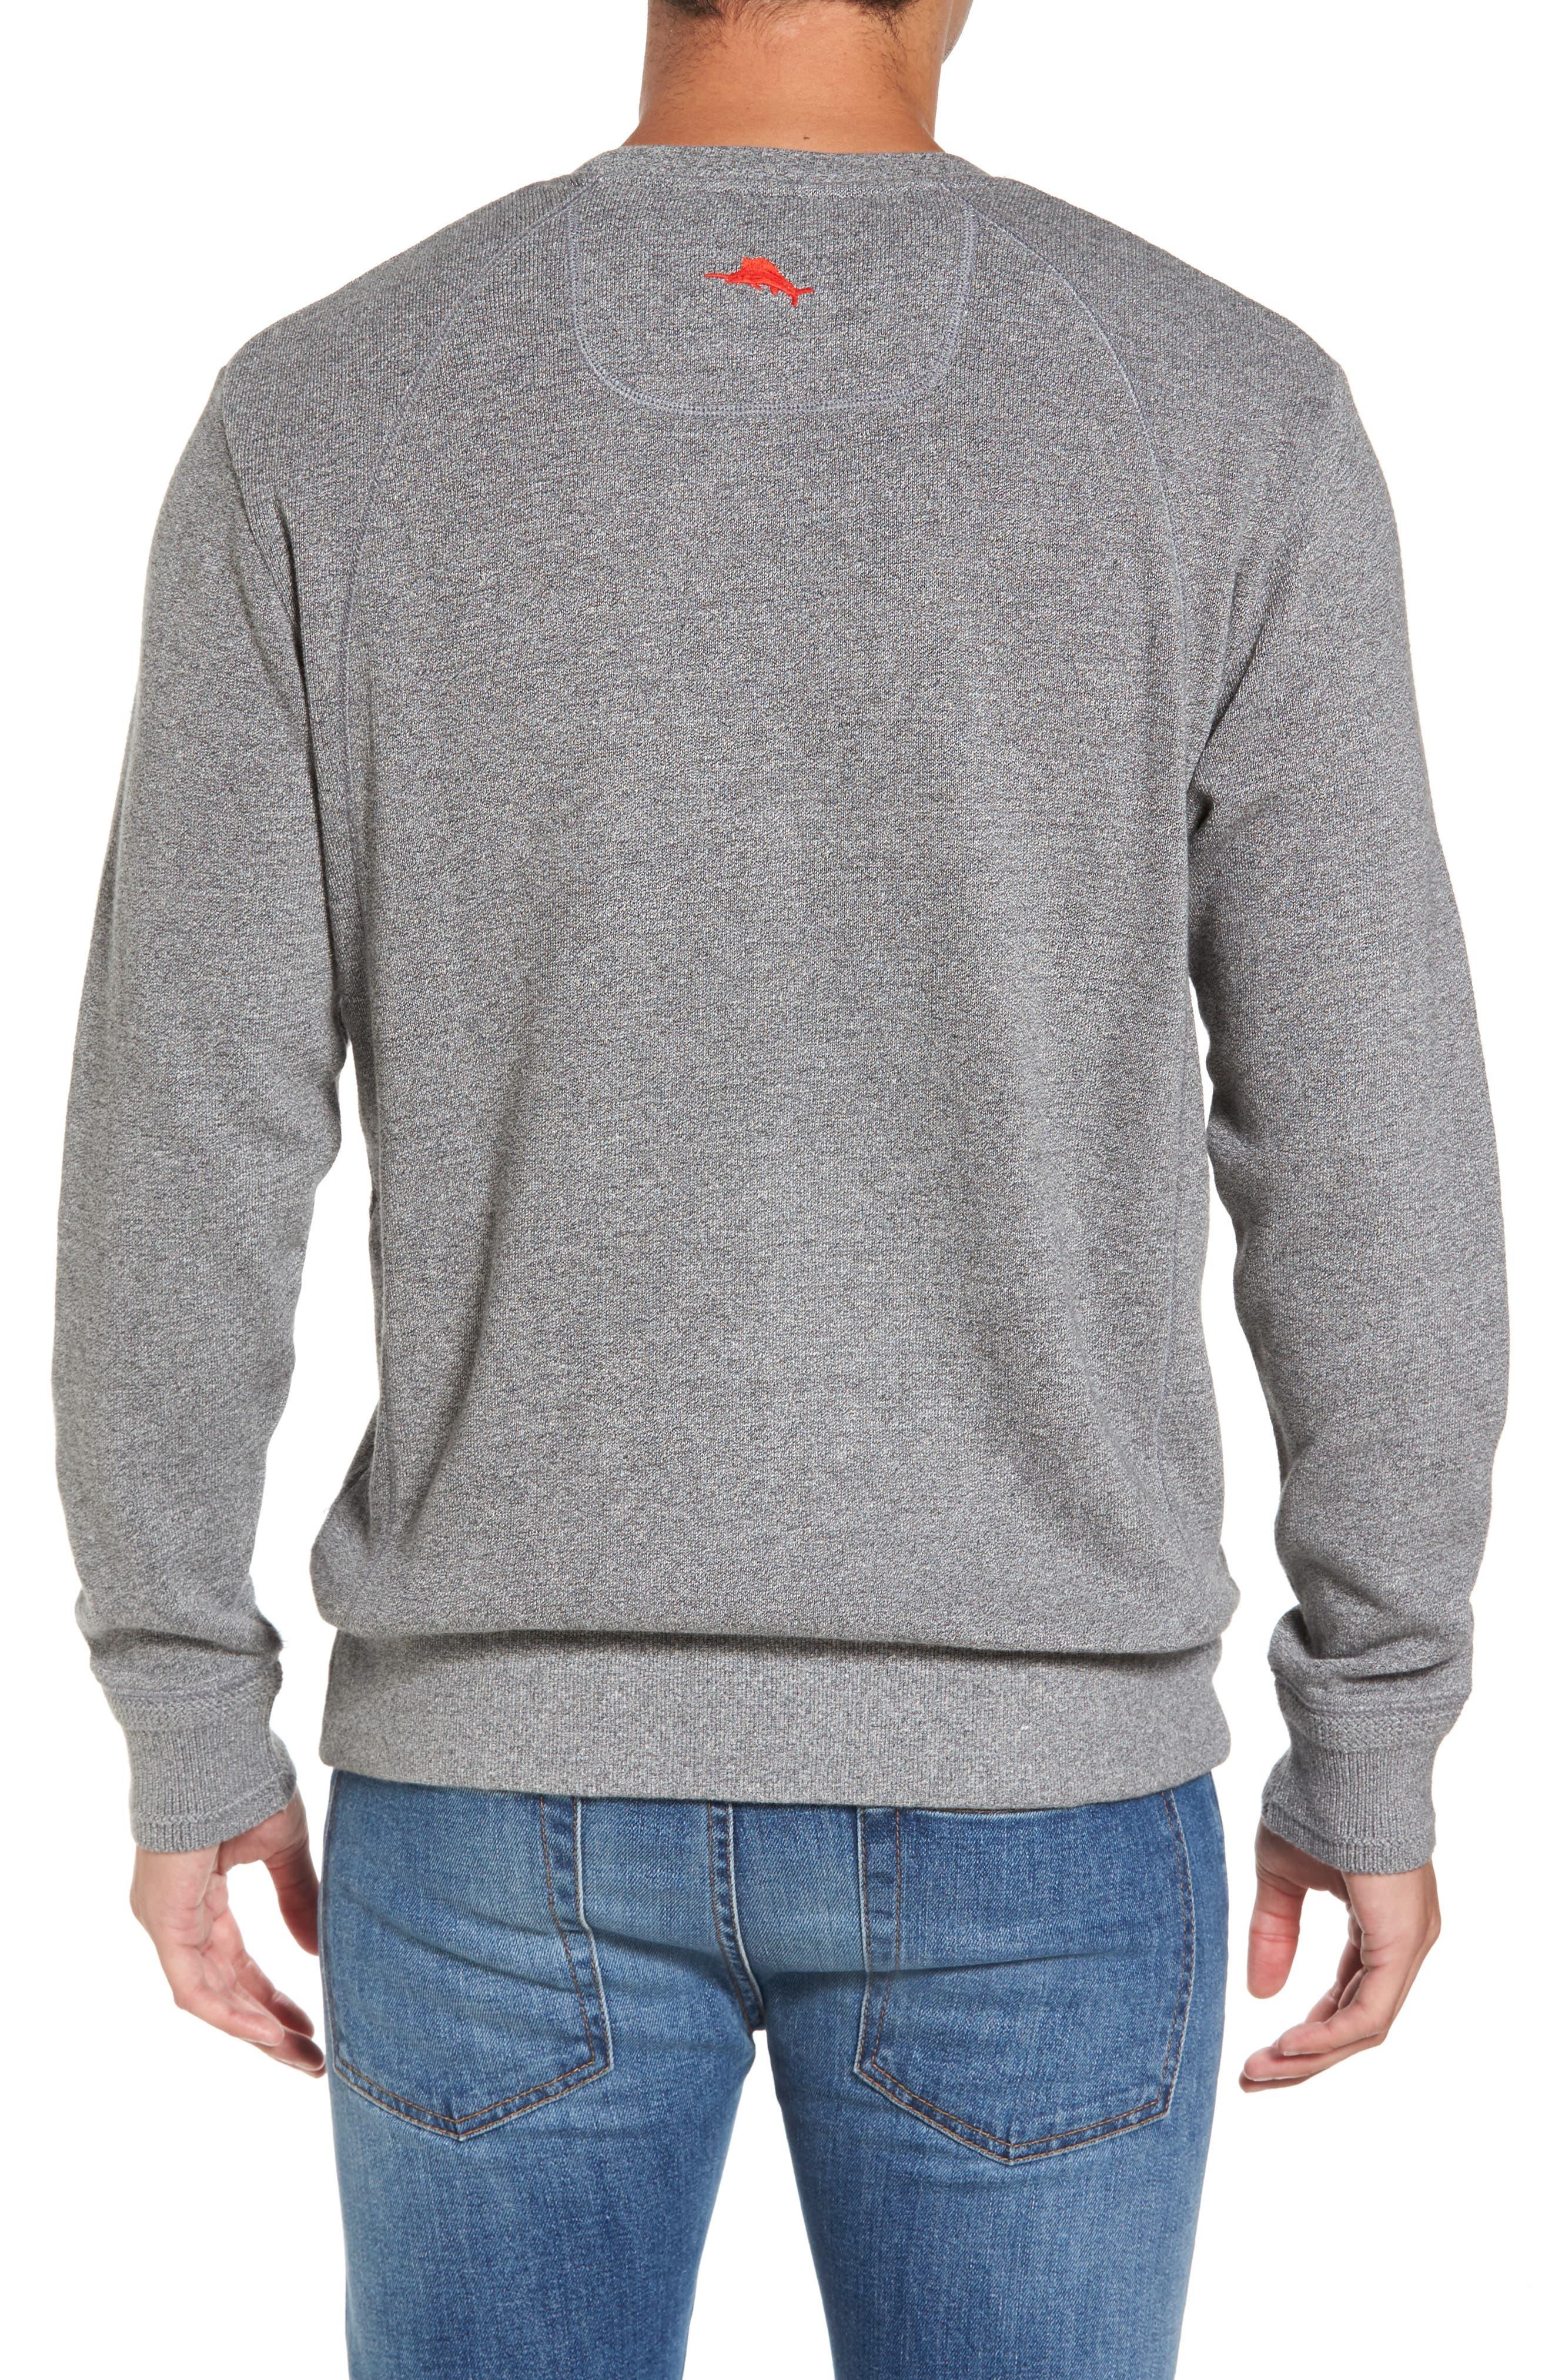 NFL Stitch of Liberty Embroidered Crewneck Sweatshirt,                             Alternate thumbnail 39, color,